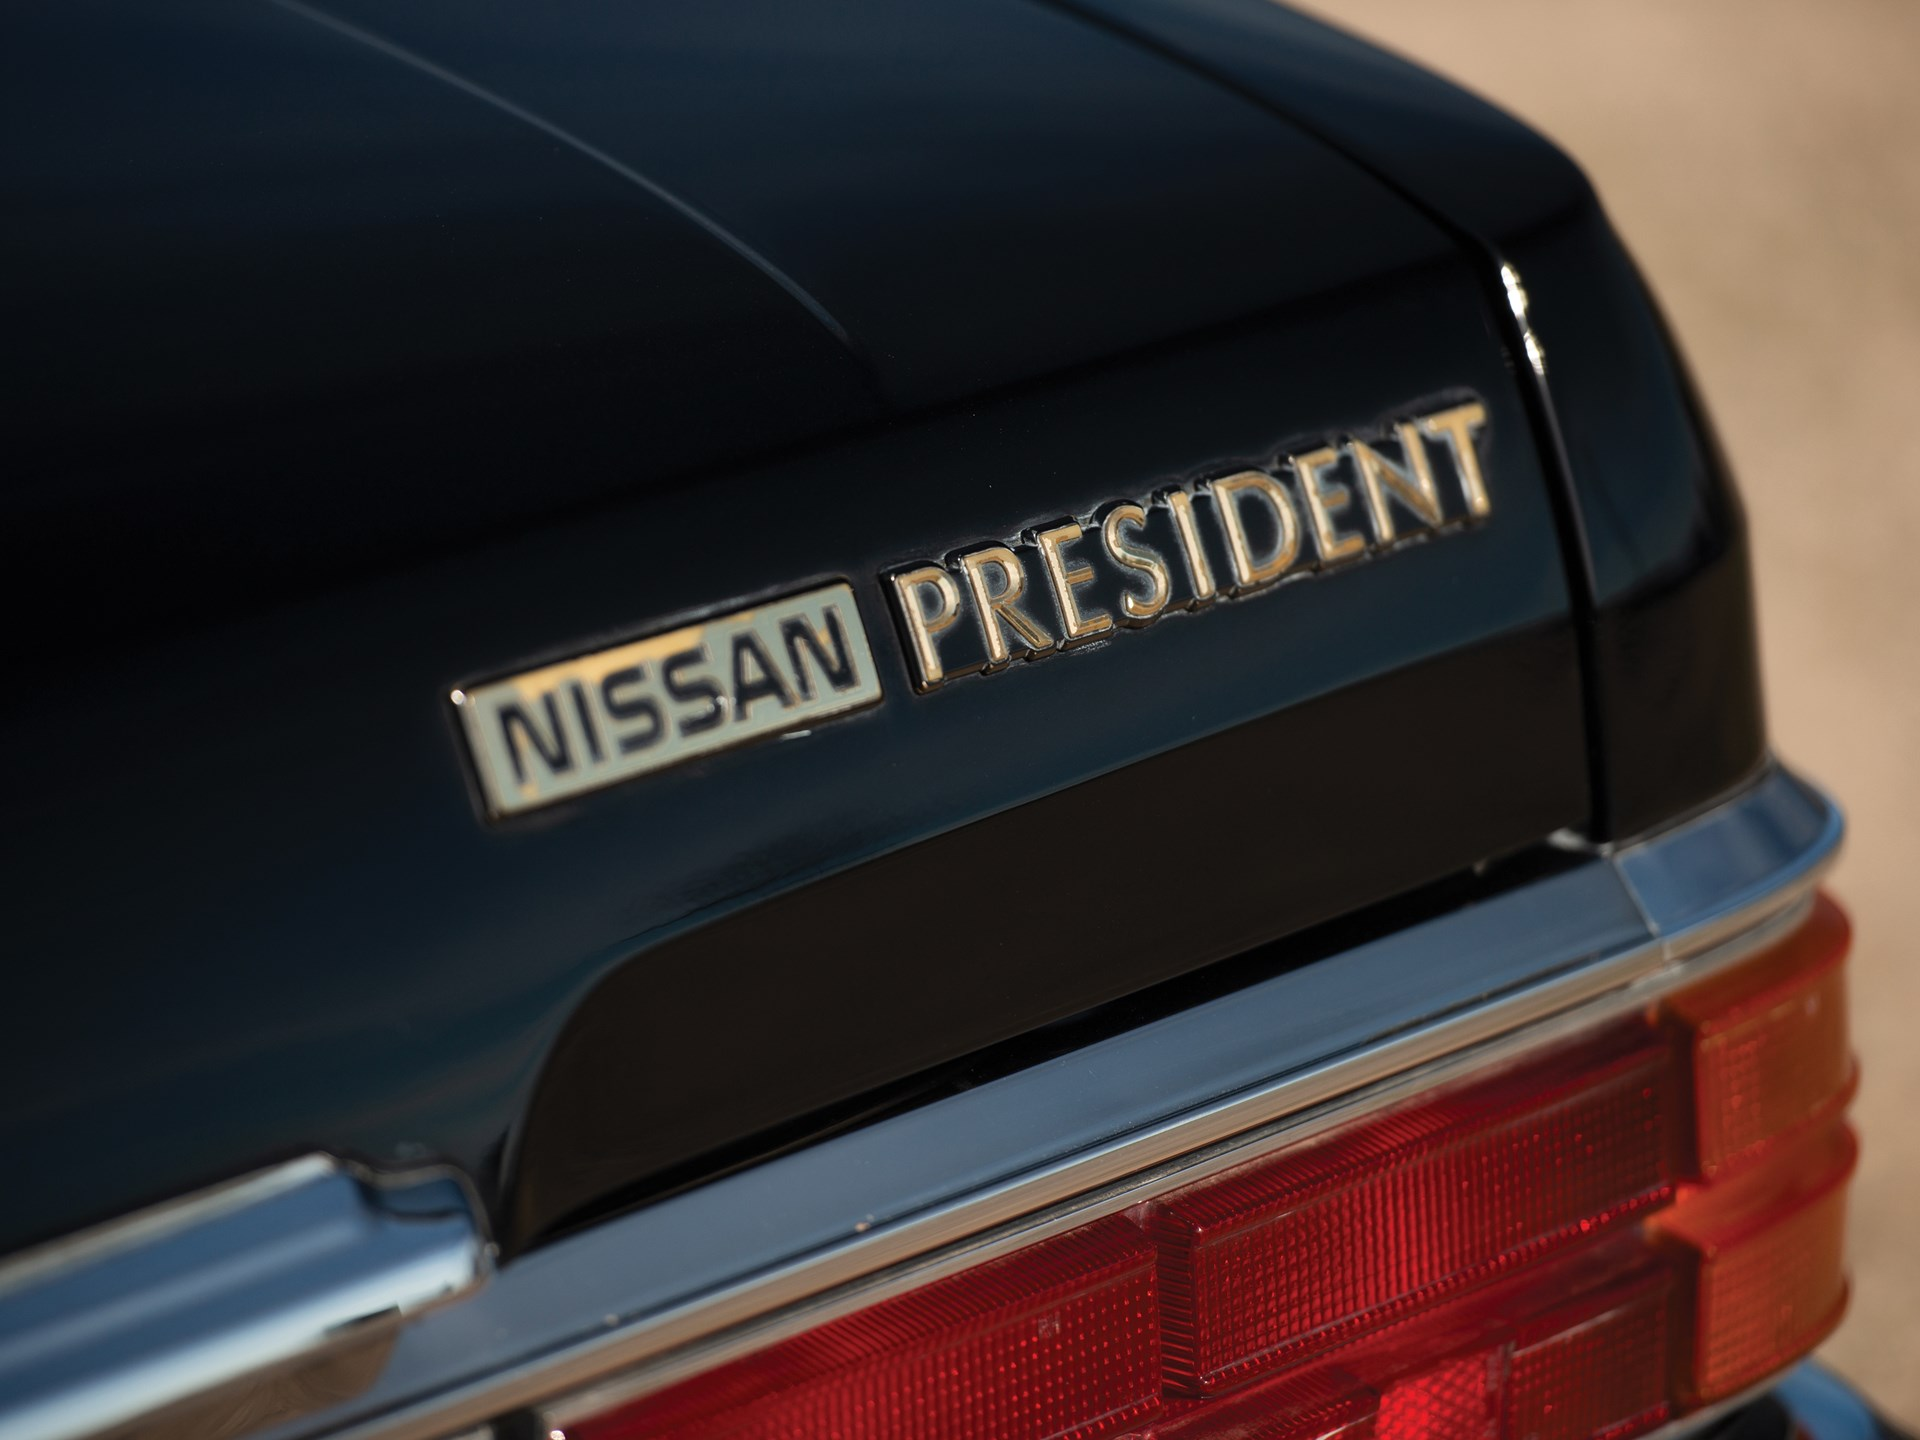 RM Sotheby's - 1987 Nissan President Sovereign V8E VIP